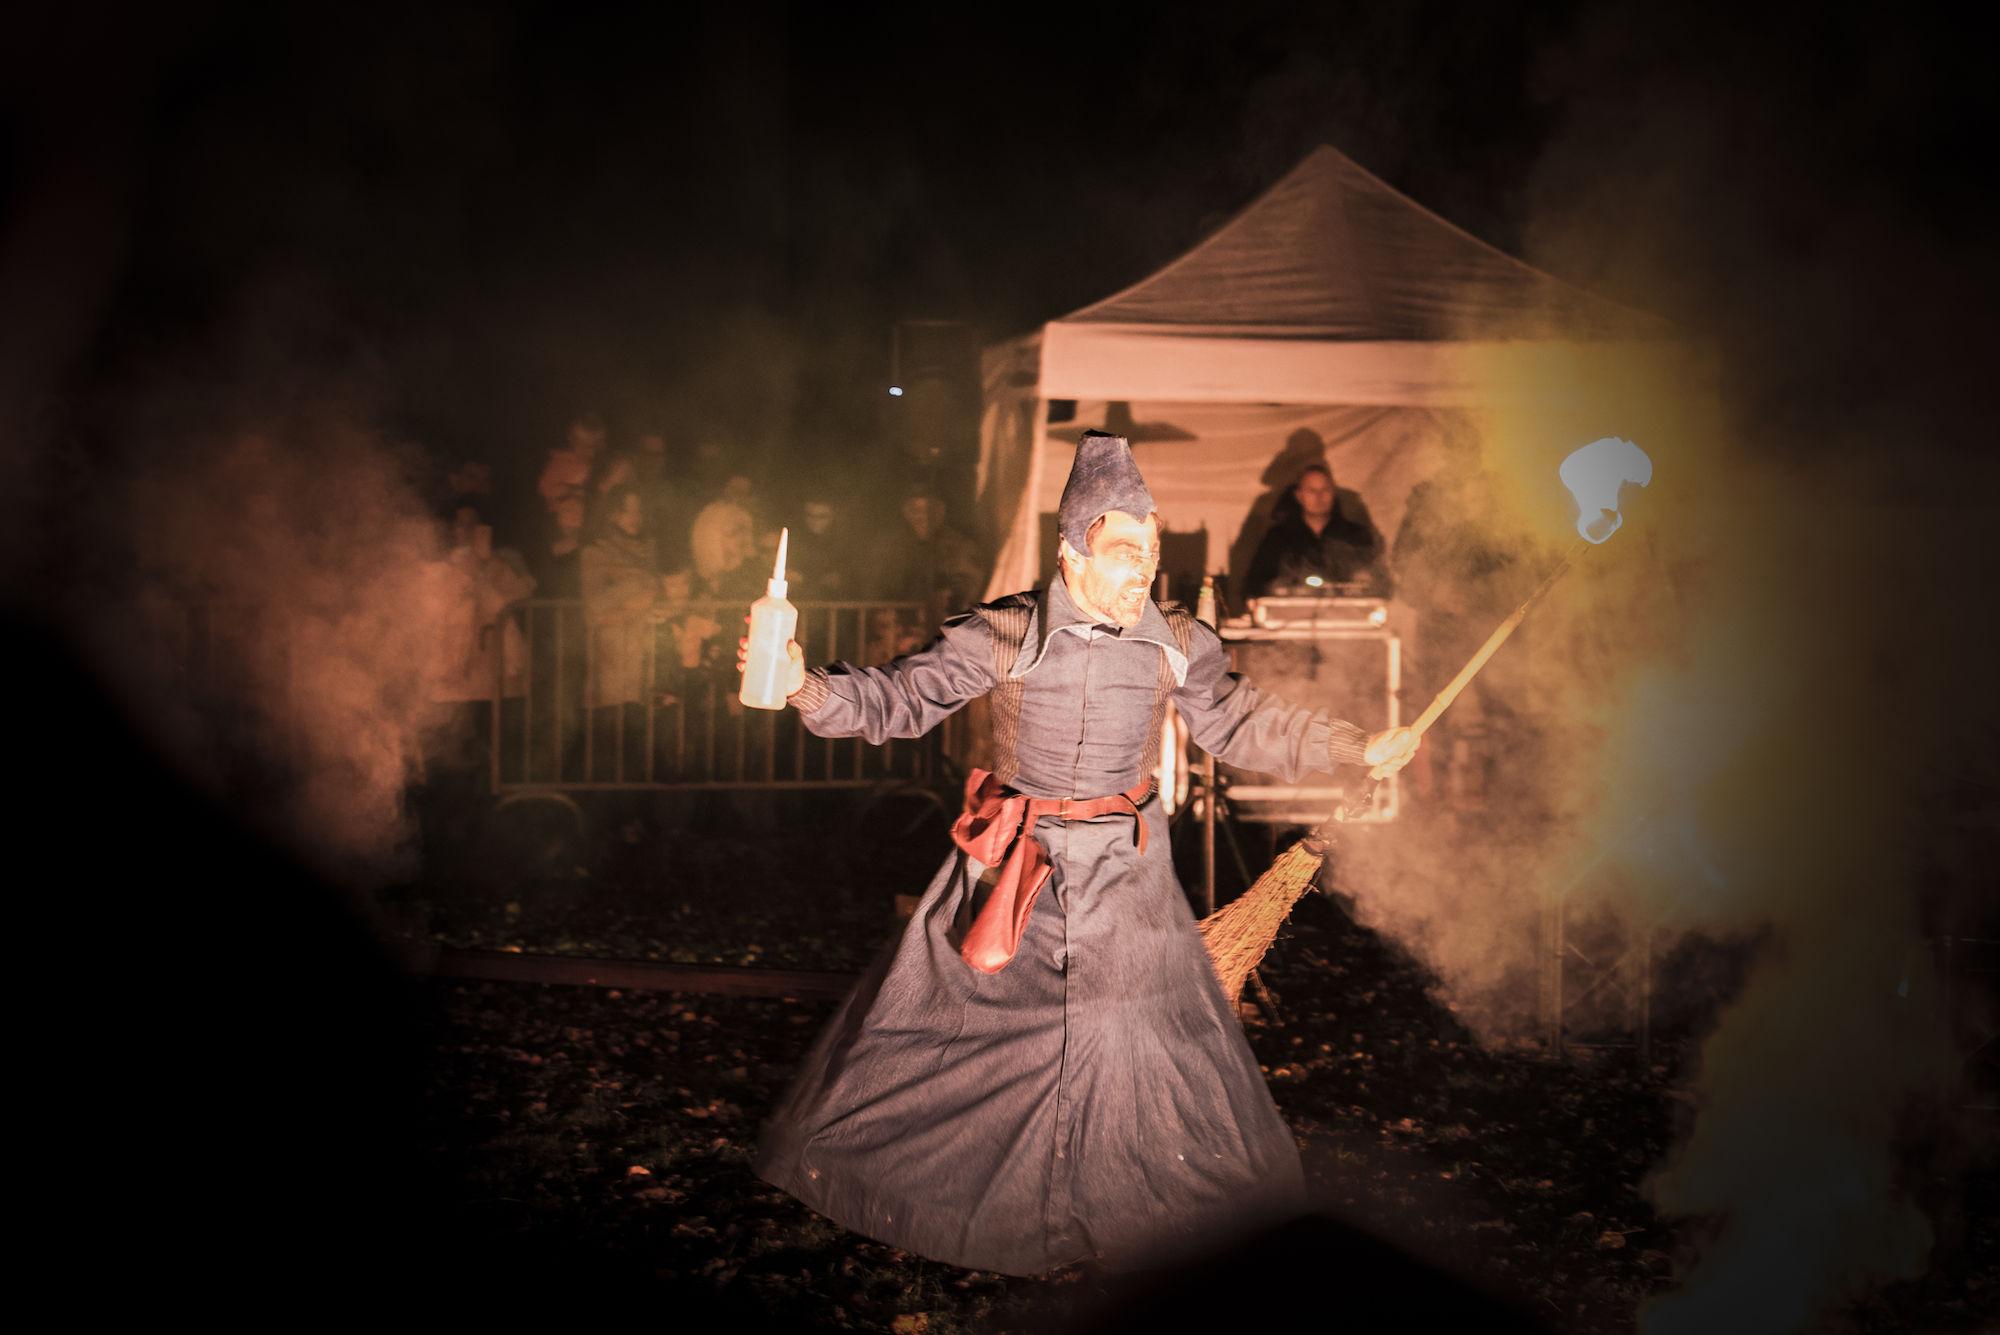 171029-Puyenbroeck-halloween-00155.jpg